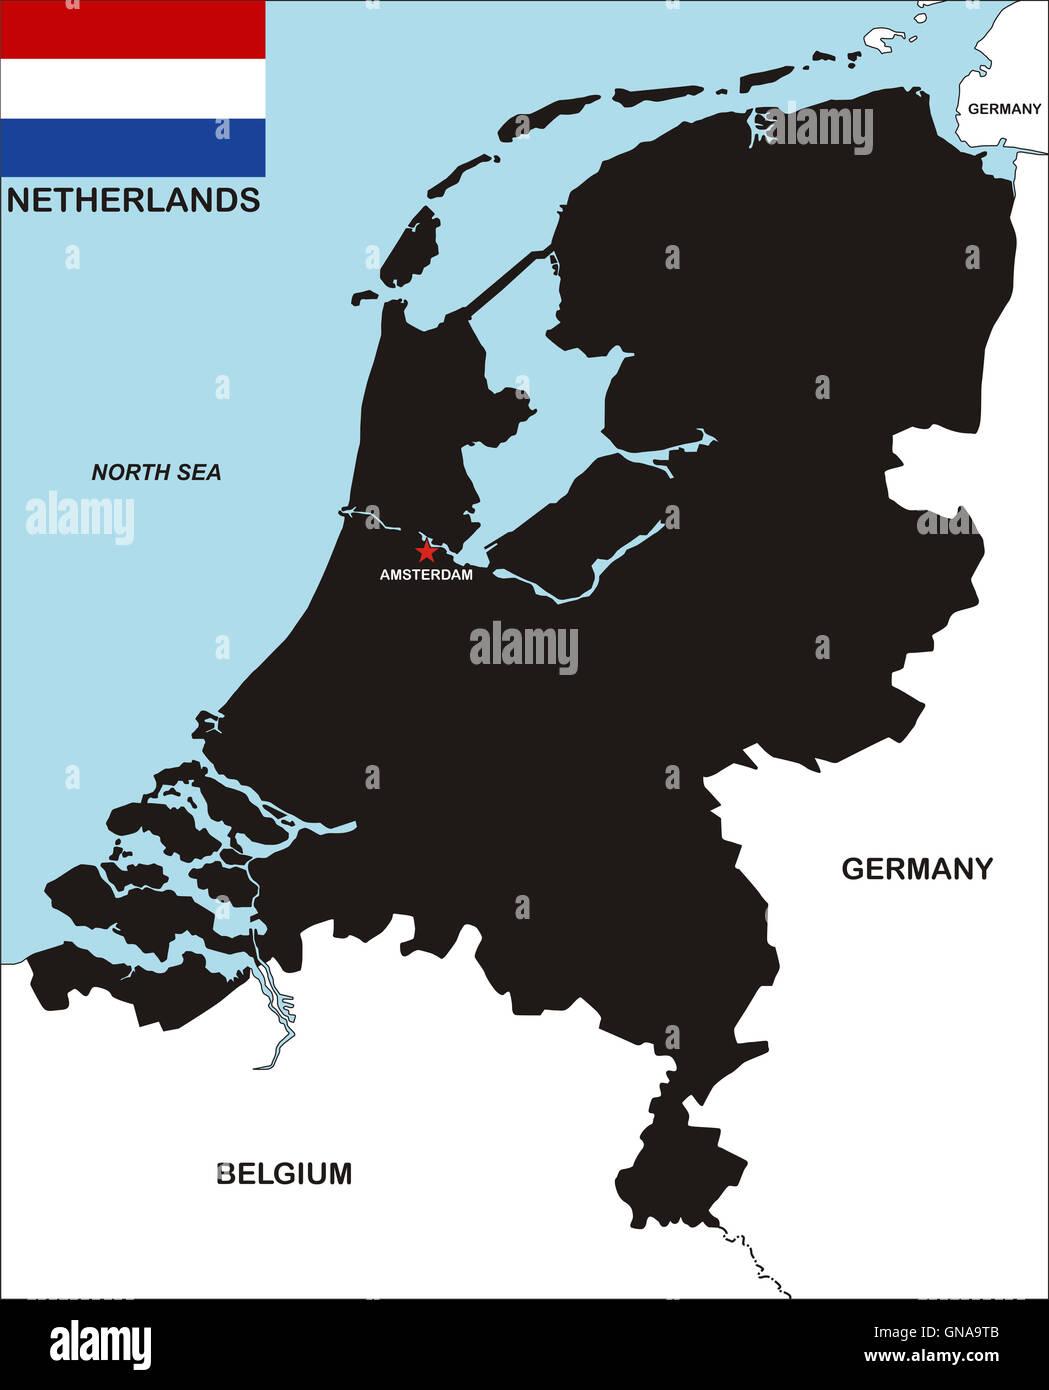 netherlands map Stock Photo Royalty Free Image 116397243 Alamy